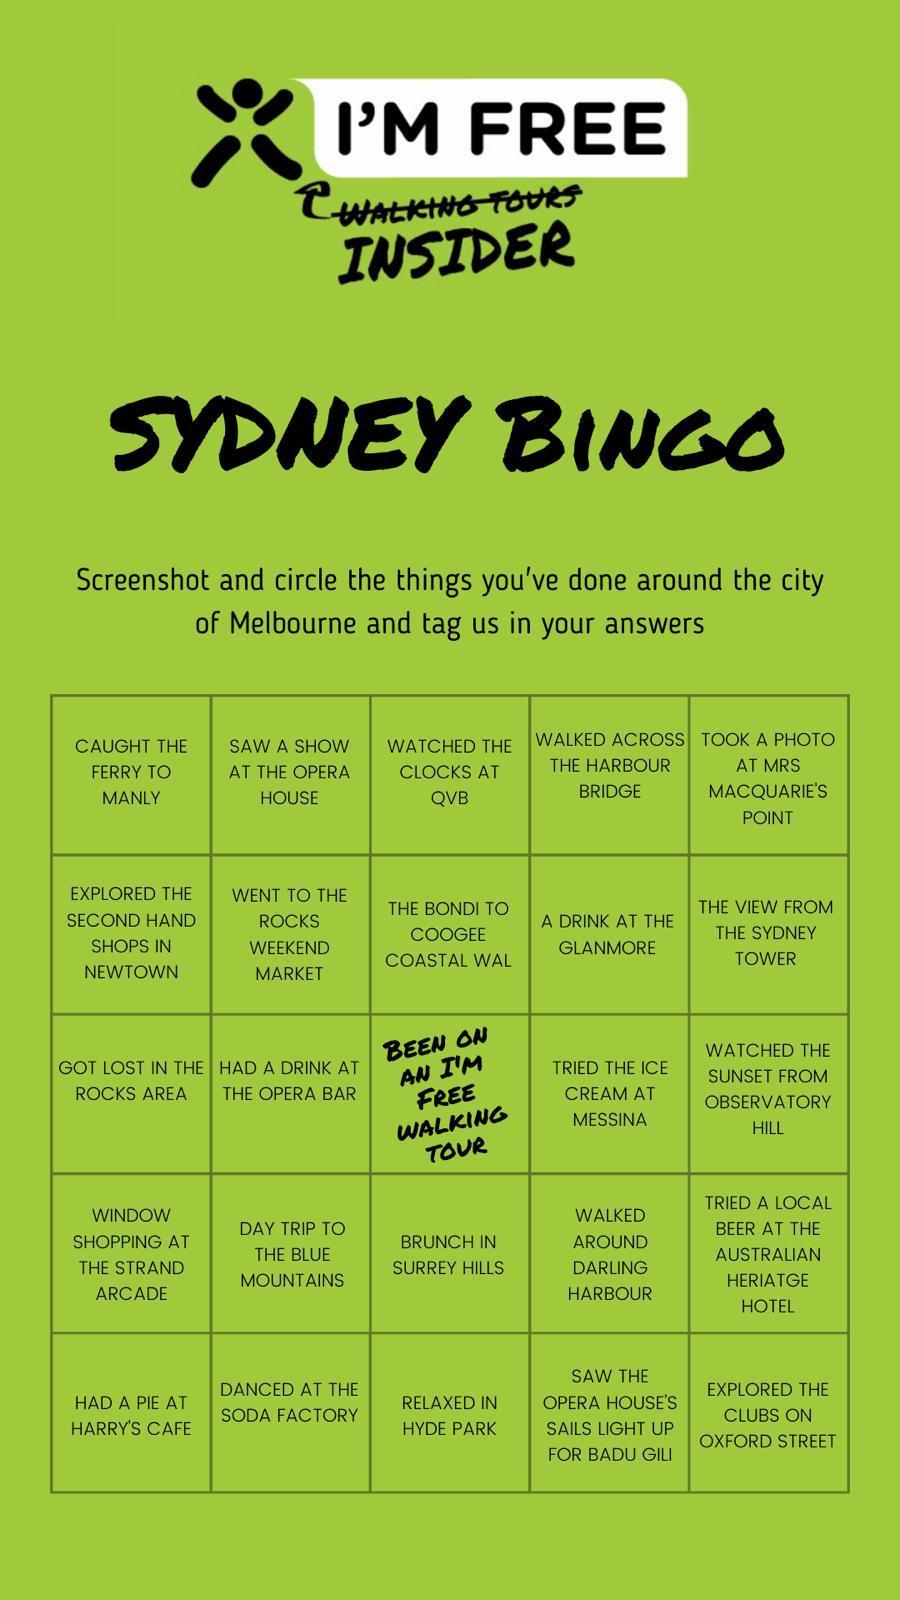 Sydney Bingo